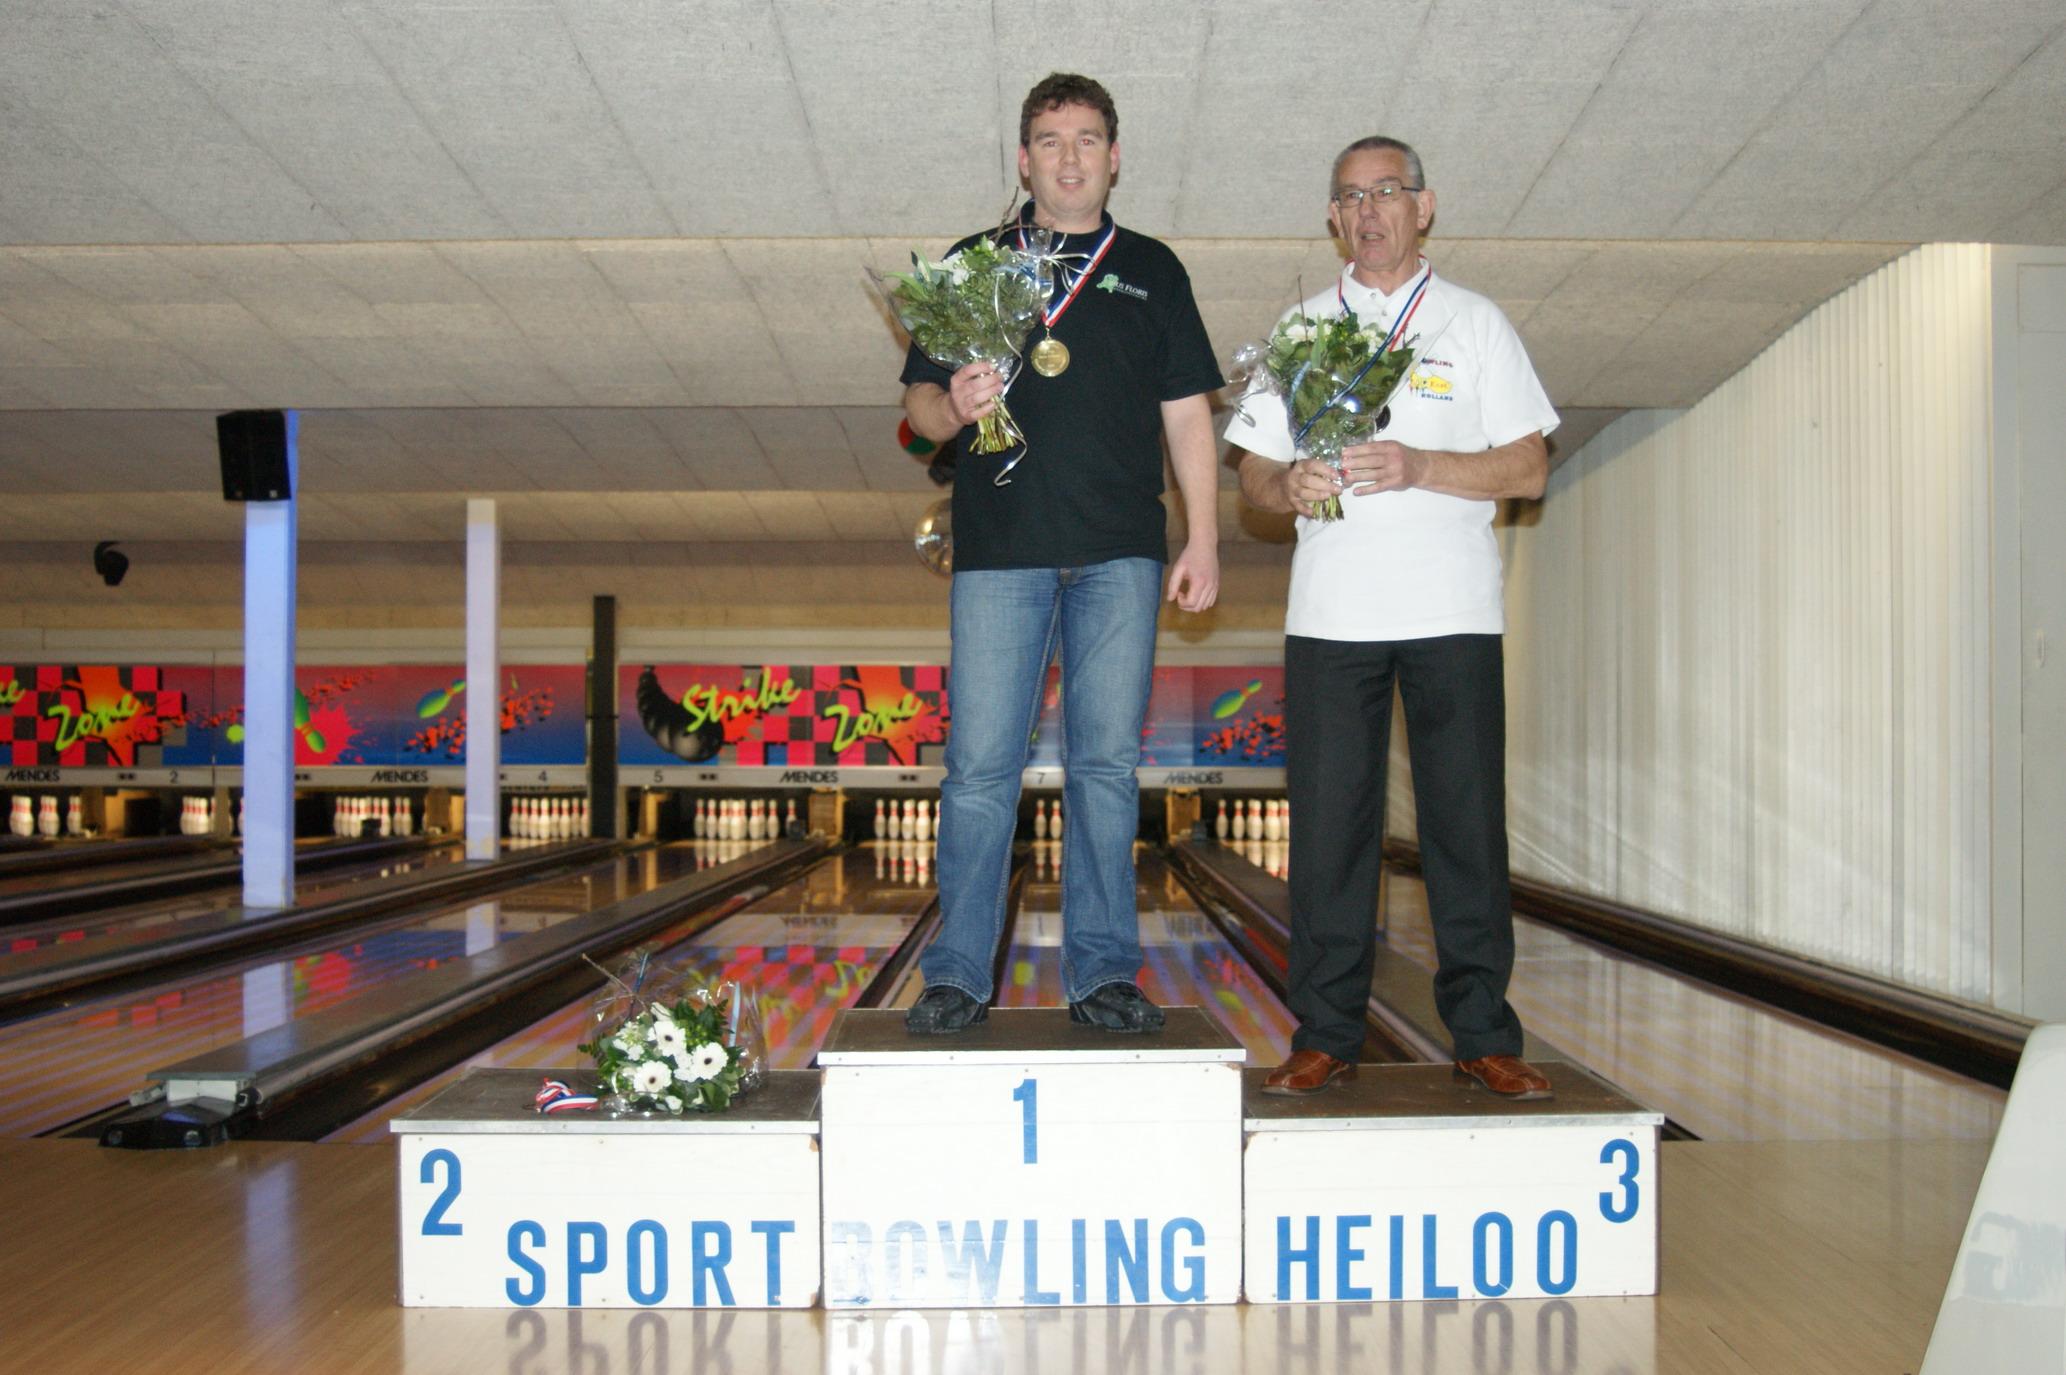 http://www.bowlingverenigingheiloo.nl/fotos_verhalen/foto's/2010_0204-Ver.kamp-Heren-CD.jpg